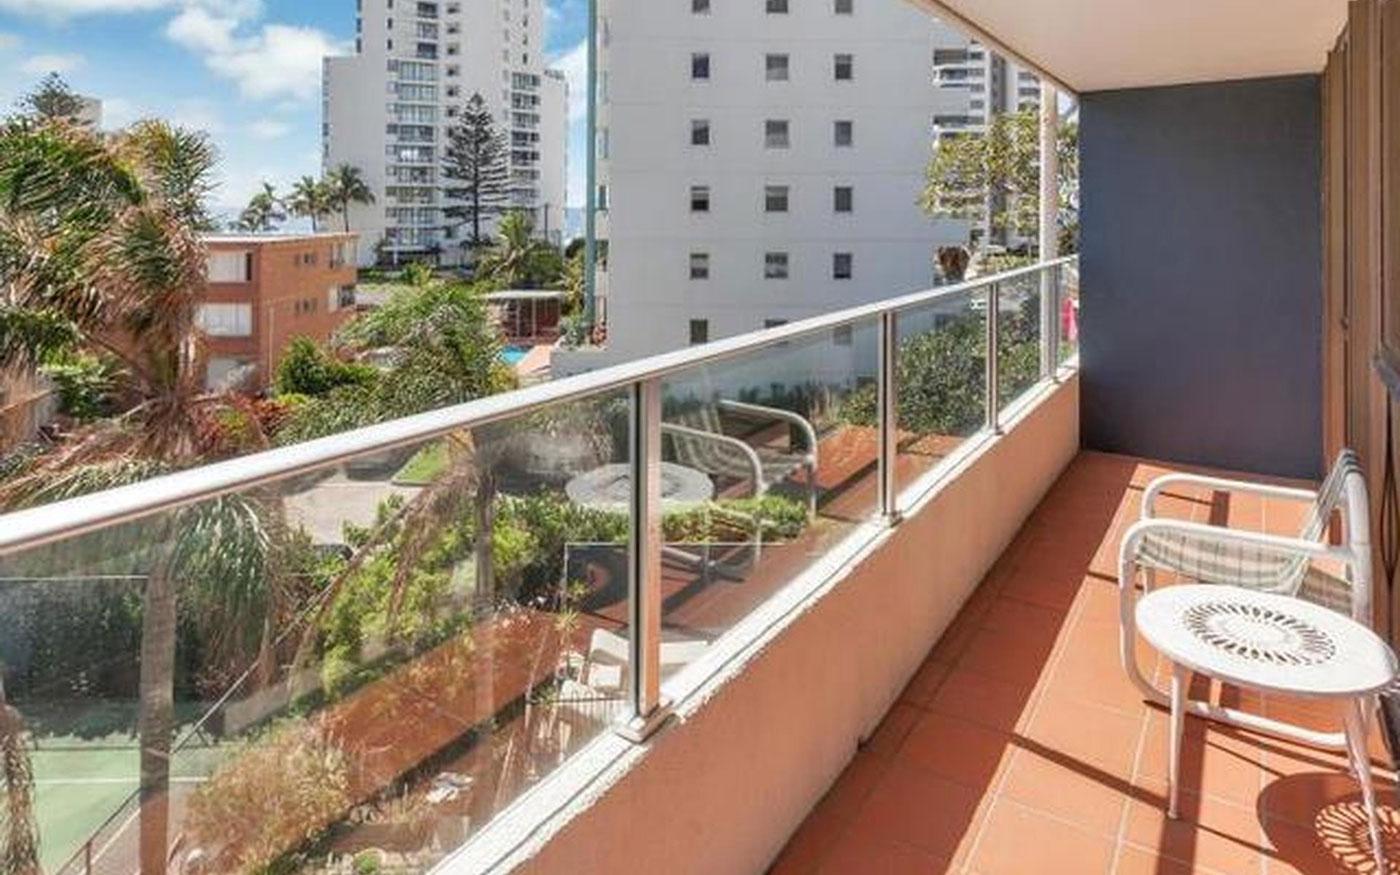 Penthouse Brisbane DEMO